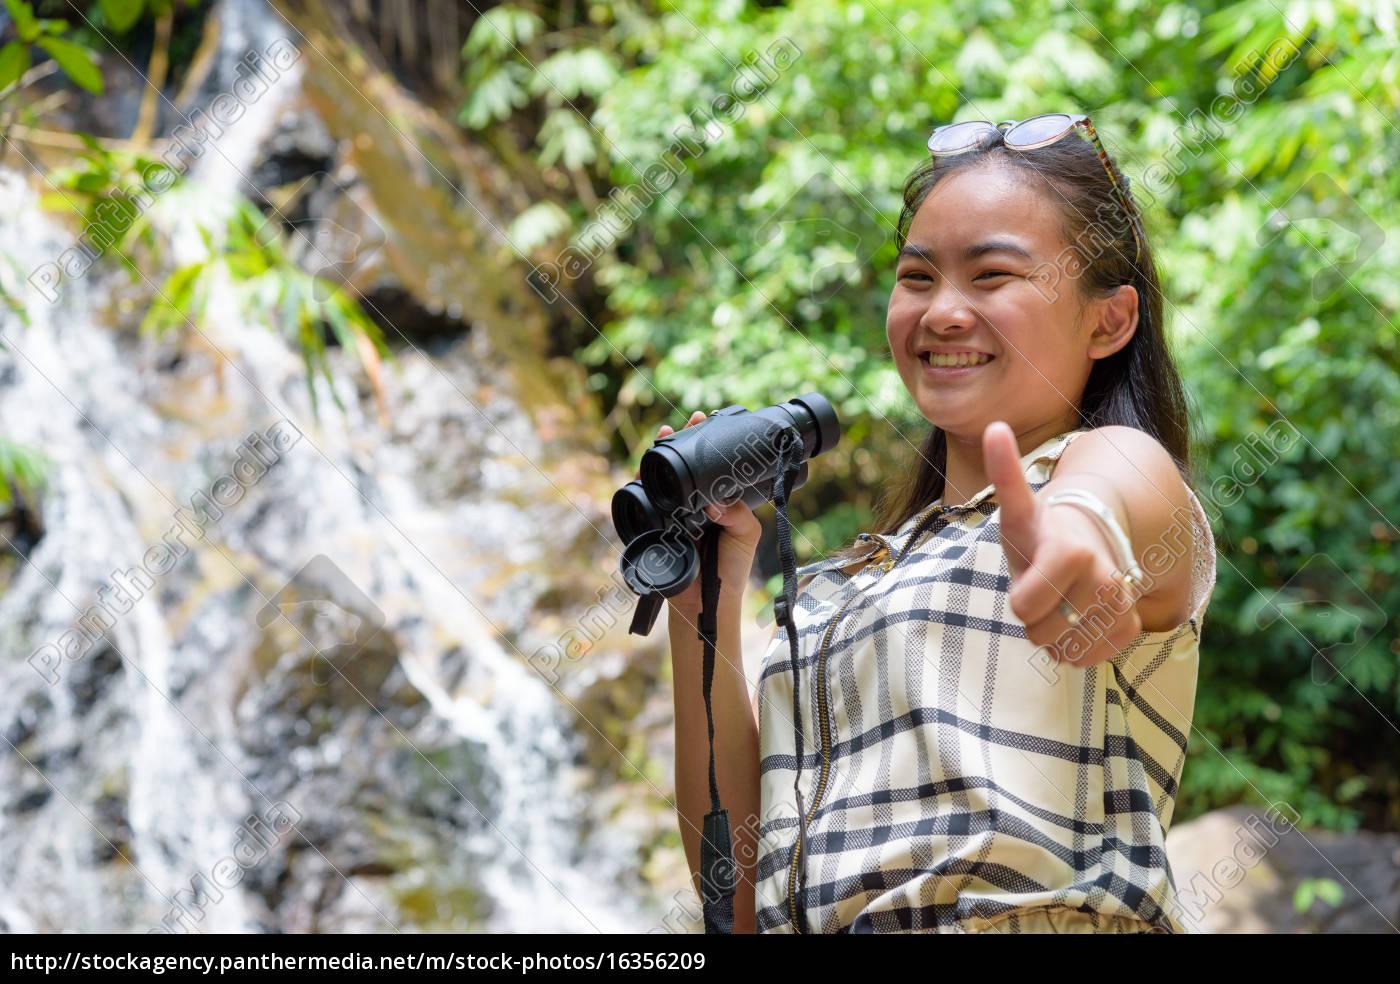 girl, using, binoculars, in, forest - 16356209